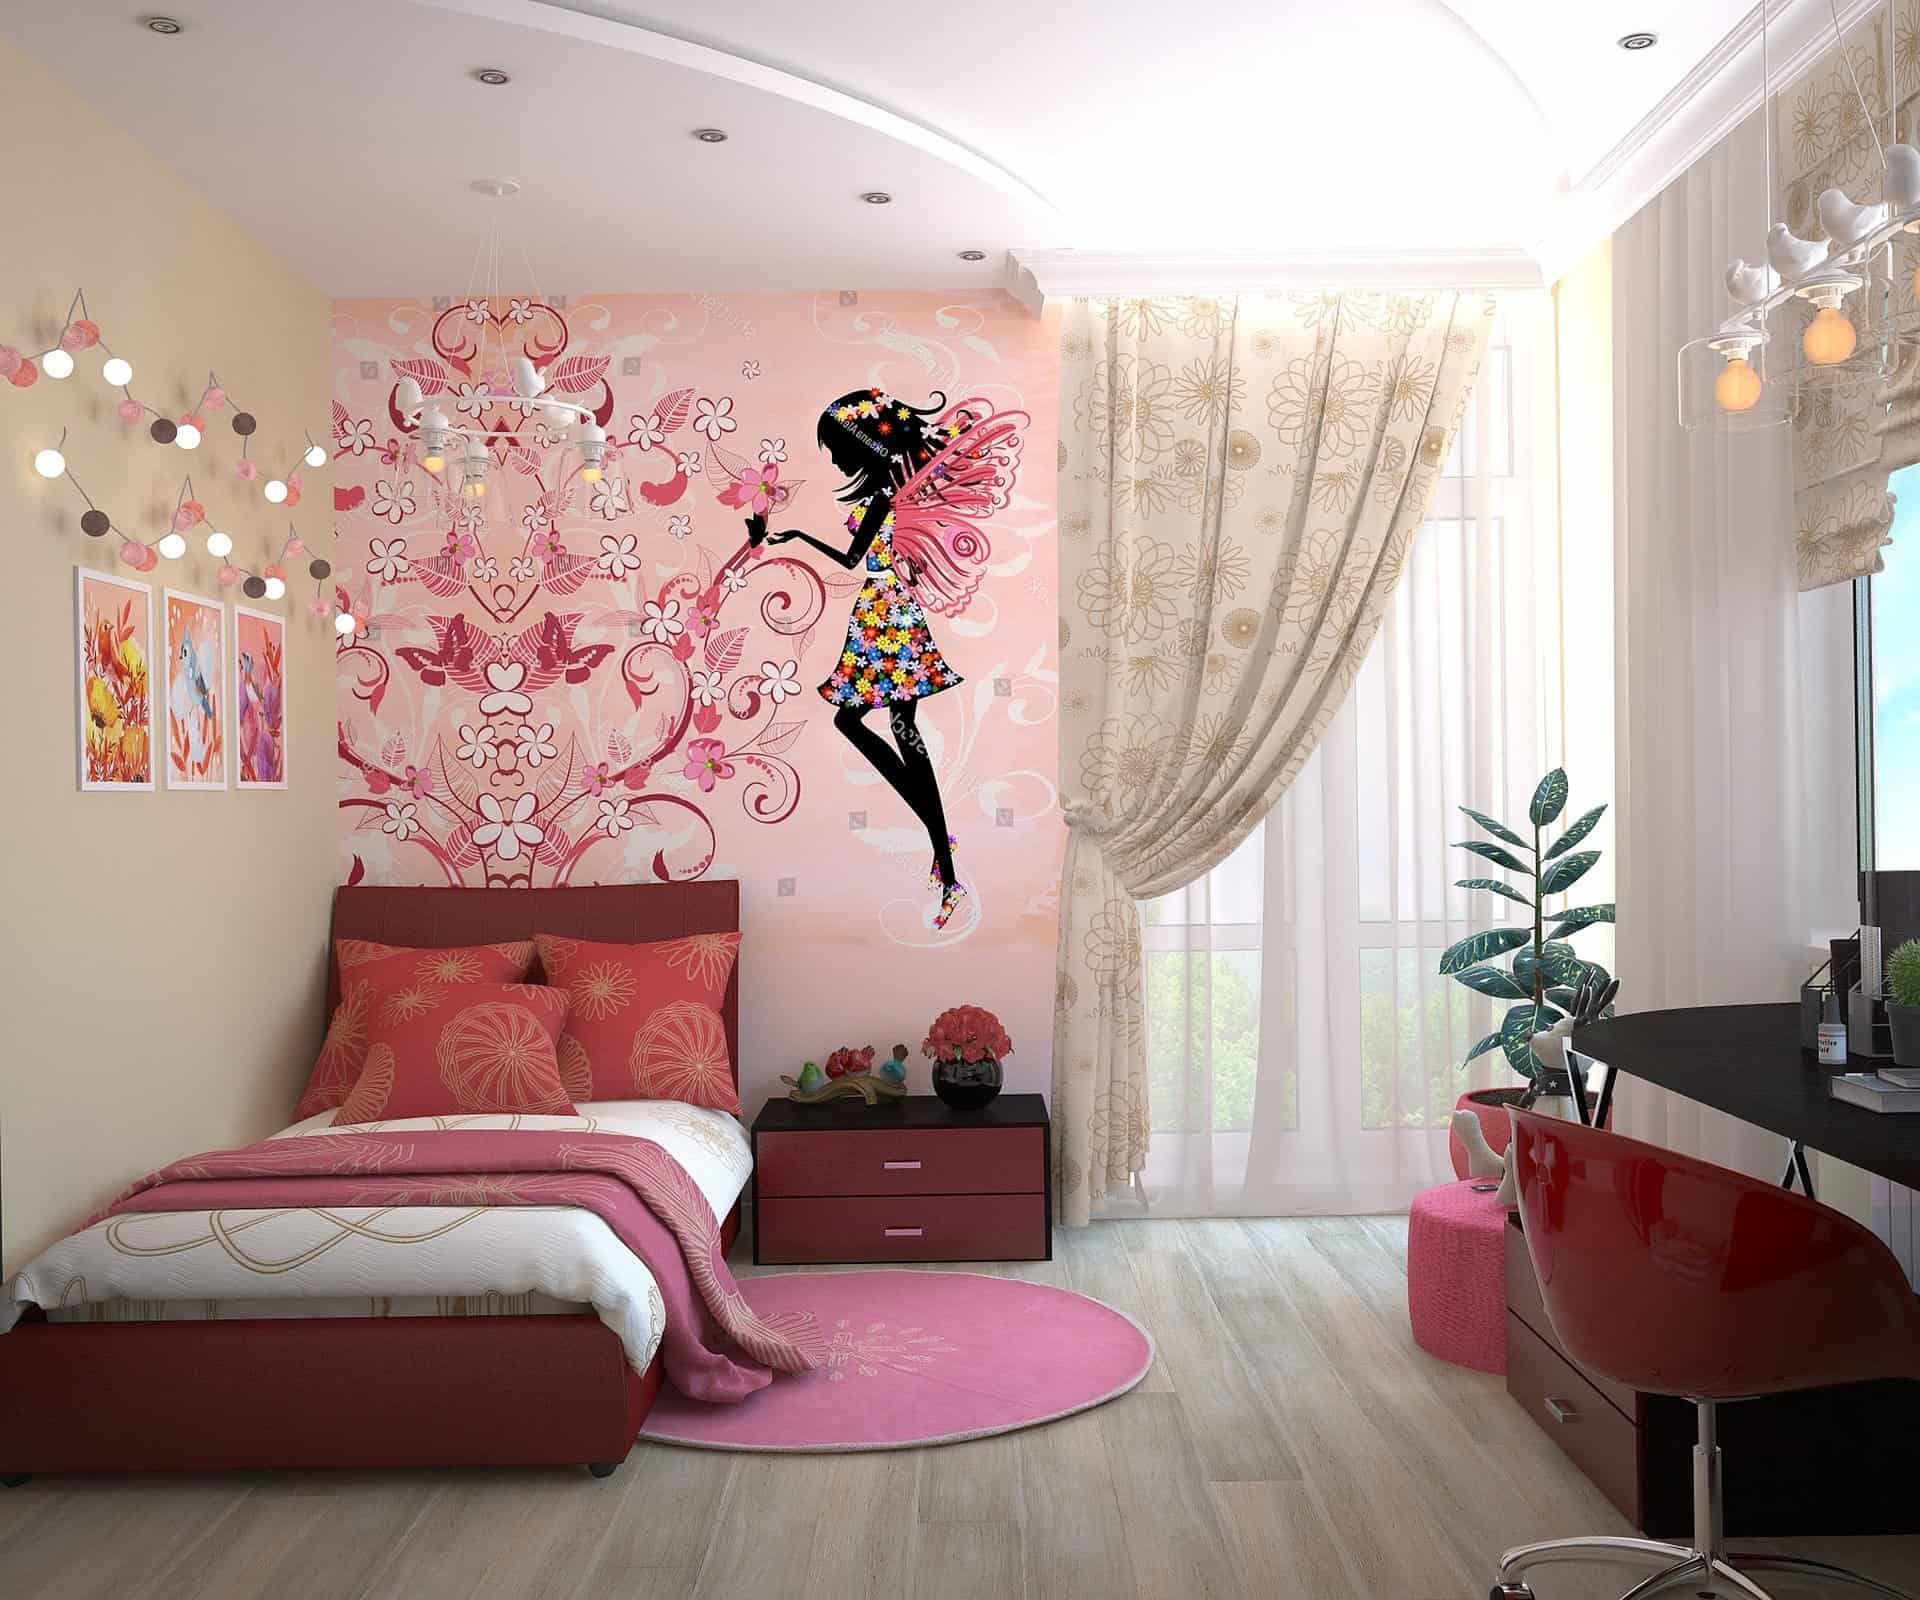 13 Diy Tween Girl Bedroom Decor Ideas Pardon Me My Crown Slipped